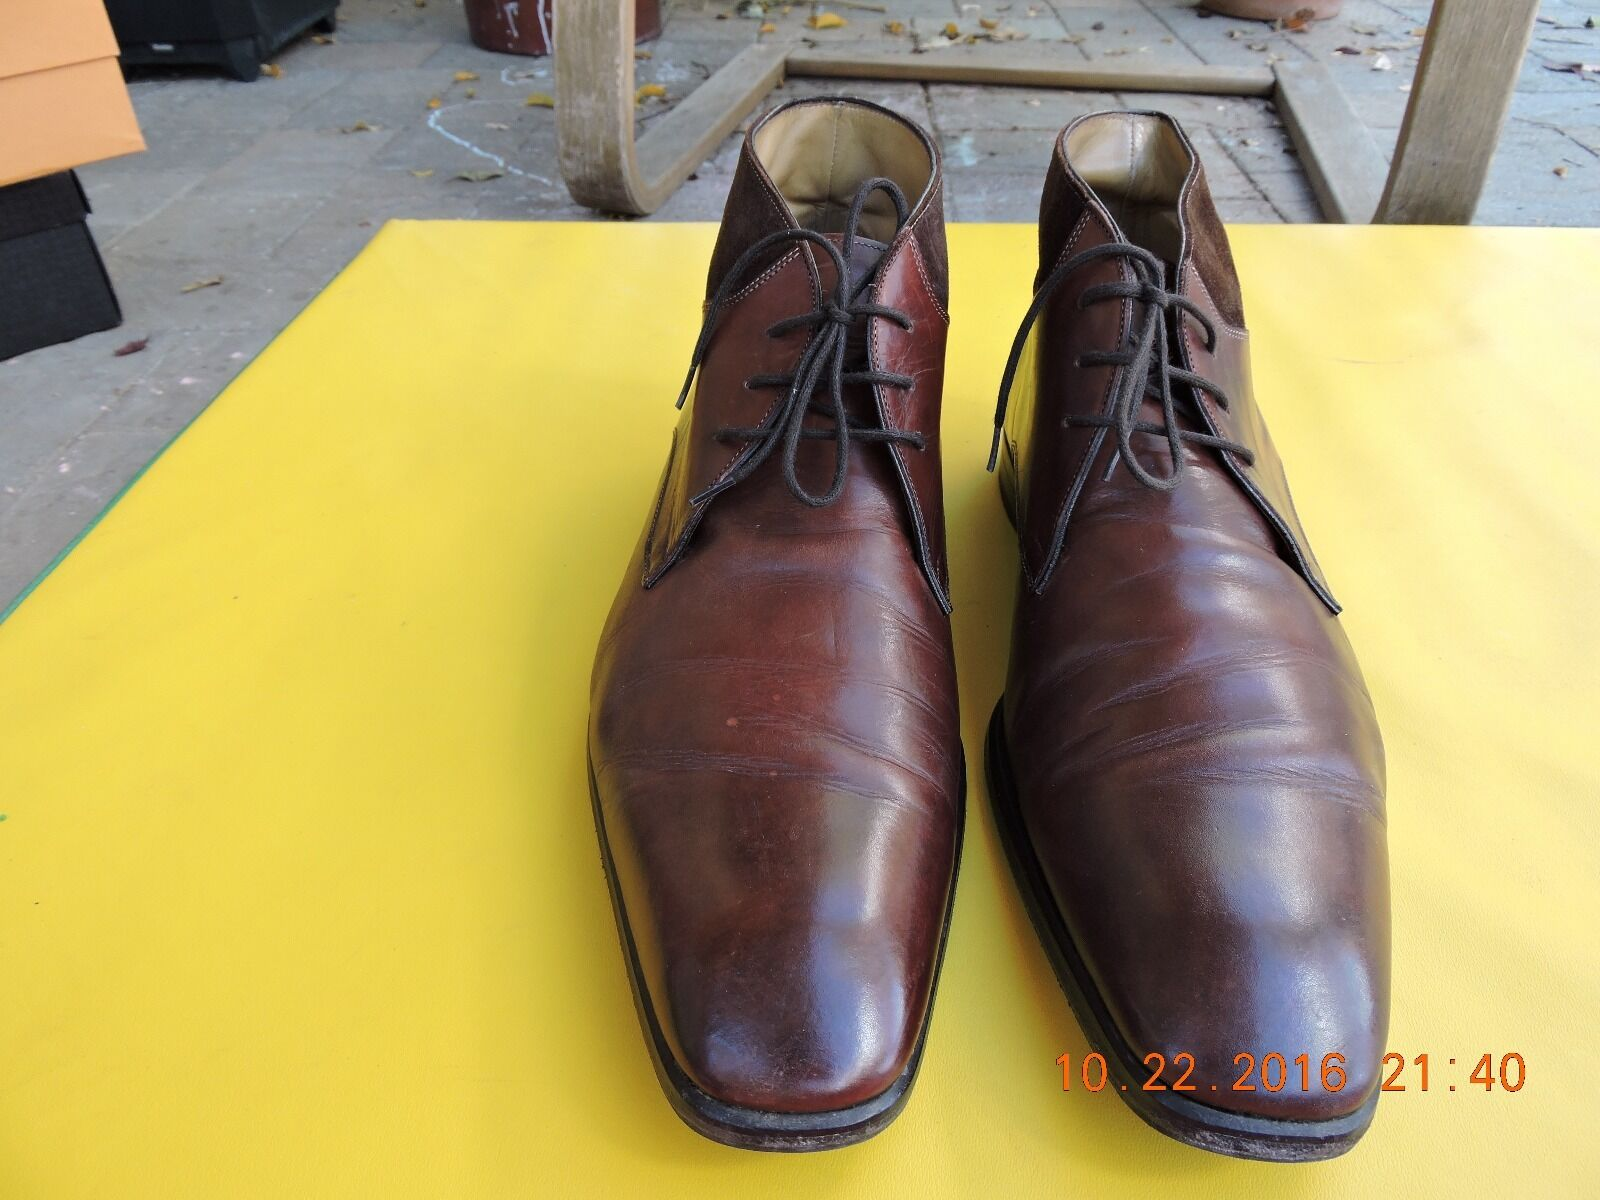 Antonio Maurizi botas hecho en Italia.